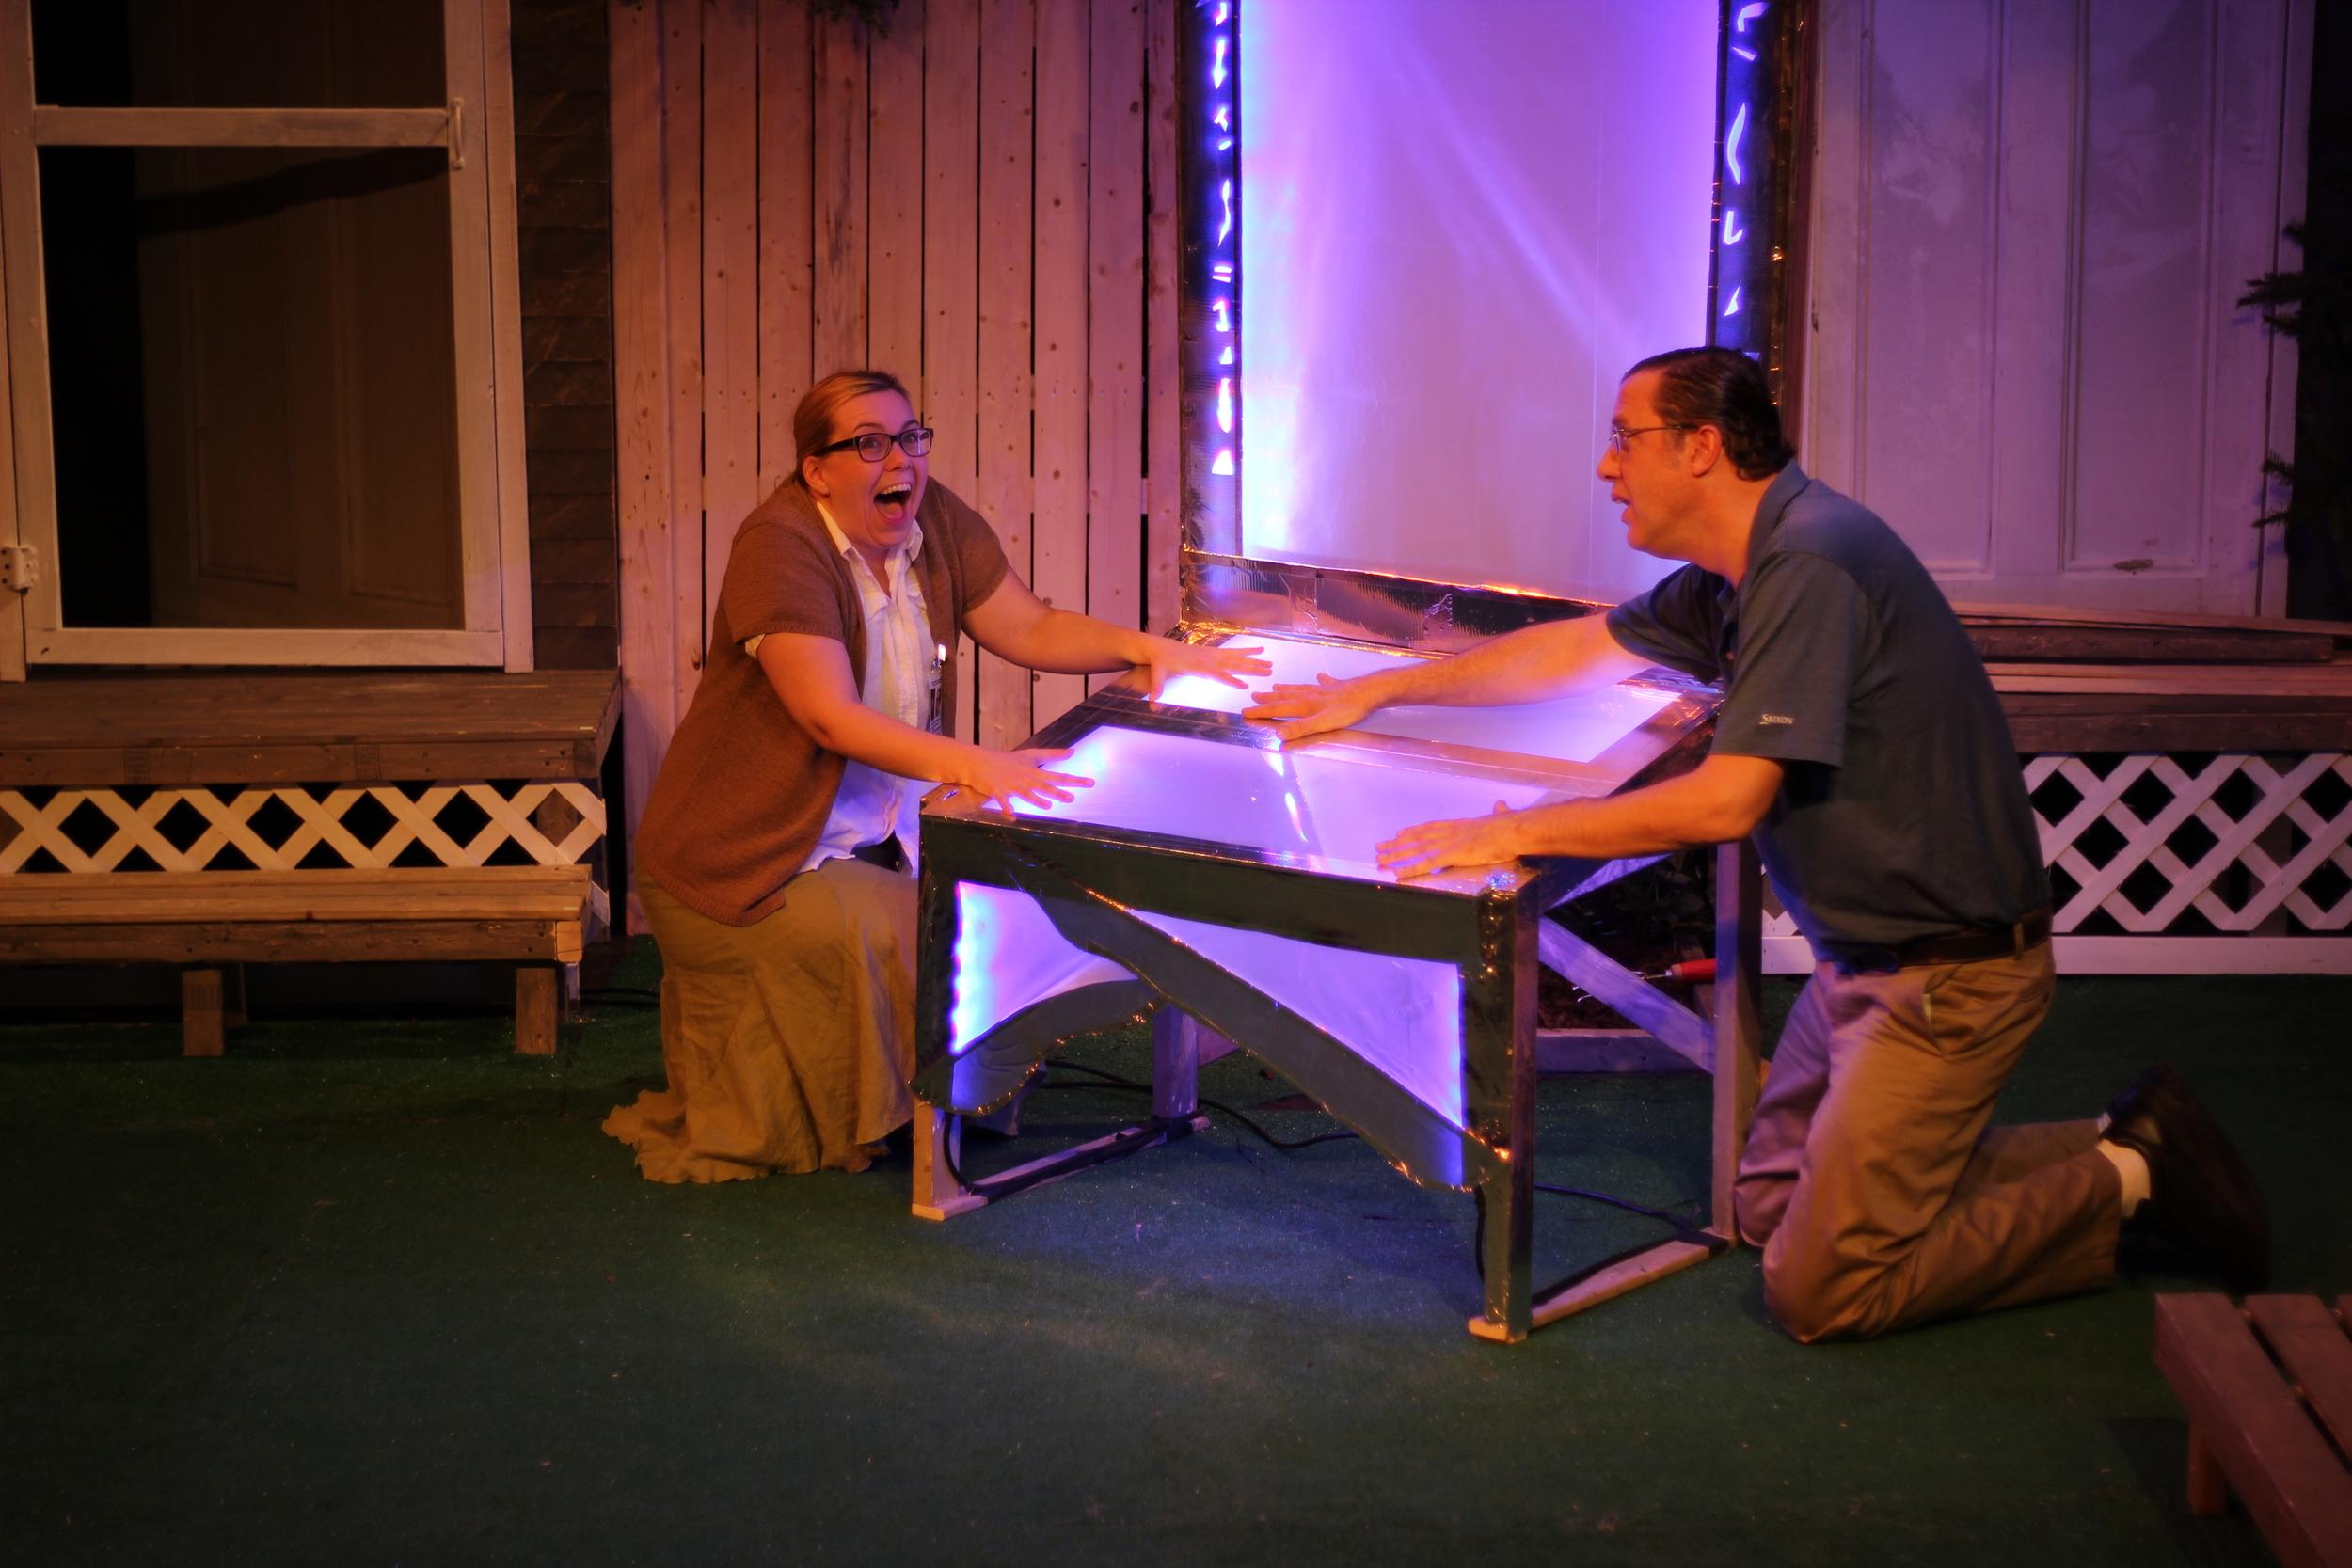 Gillian Mackay-Smith as Melanie and Daniel Boudreau as Griffin; Photo by Jessie Baxter